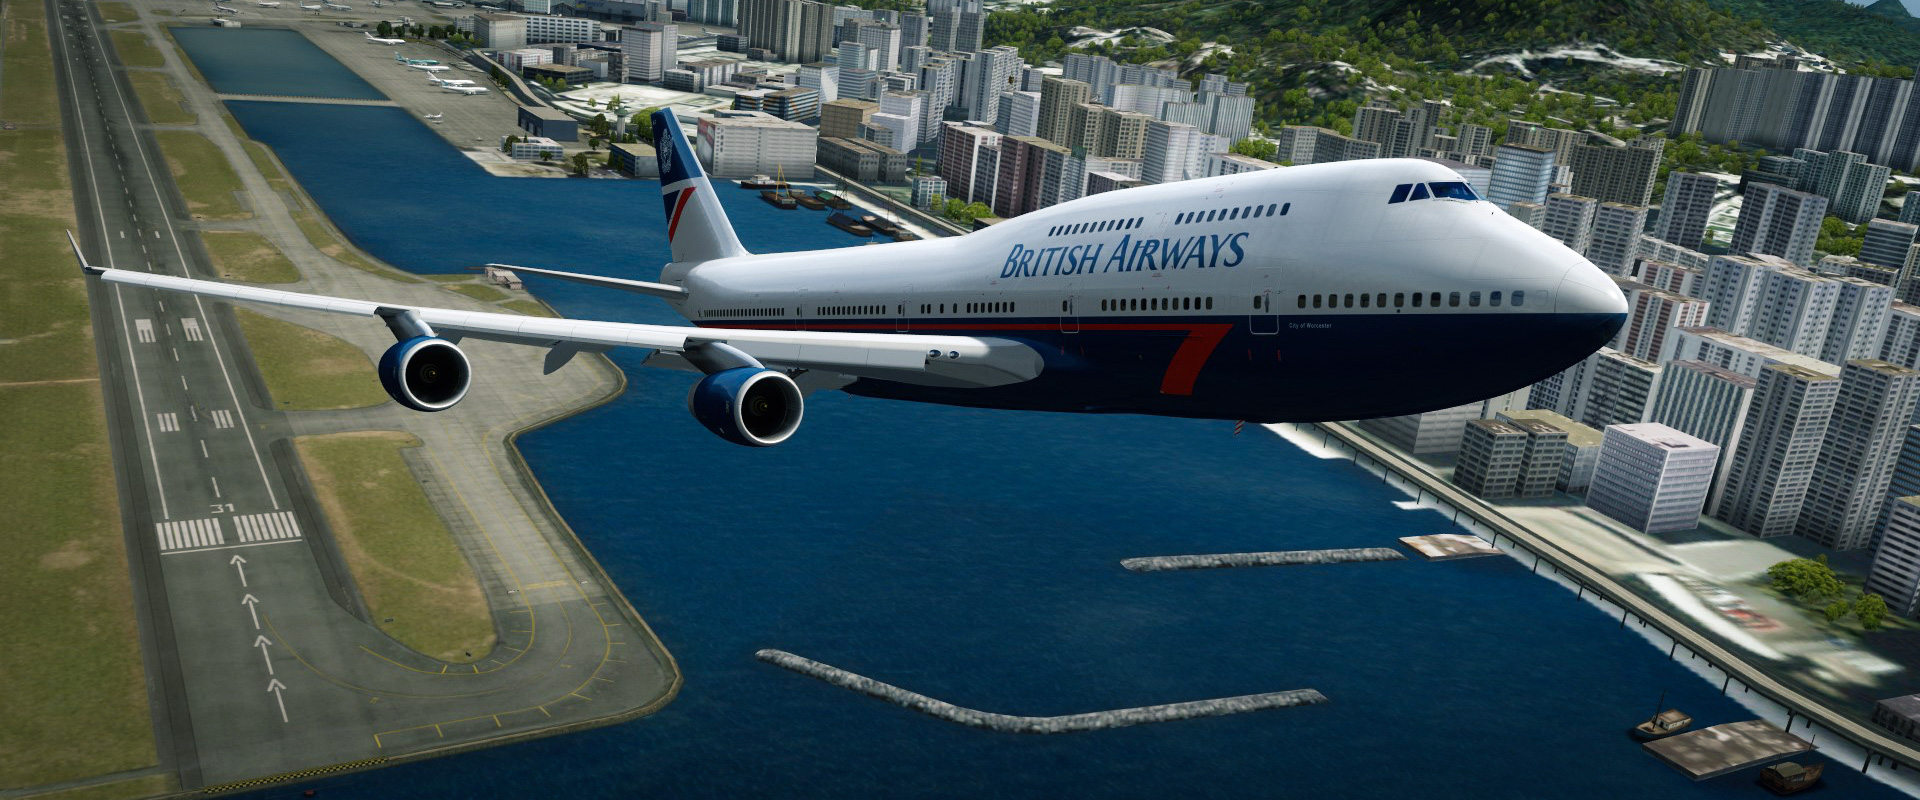 Flaps - 737 vs 747 #1 • C-Aviation